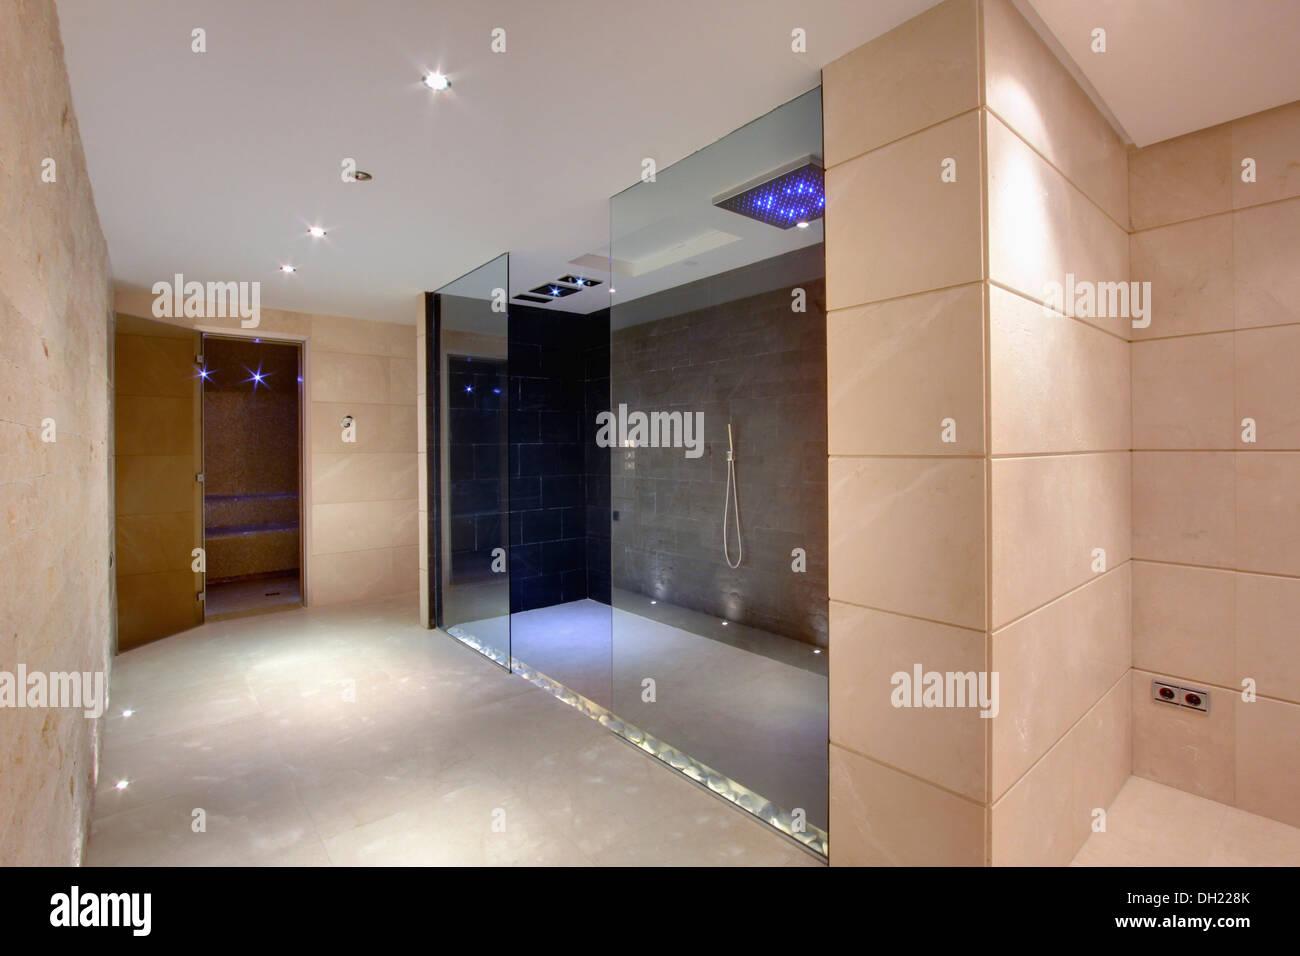 Large Walk In Shower In Modern Bathroom In Newly Built Villa In Southern  Spain